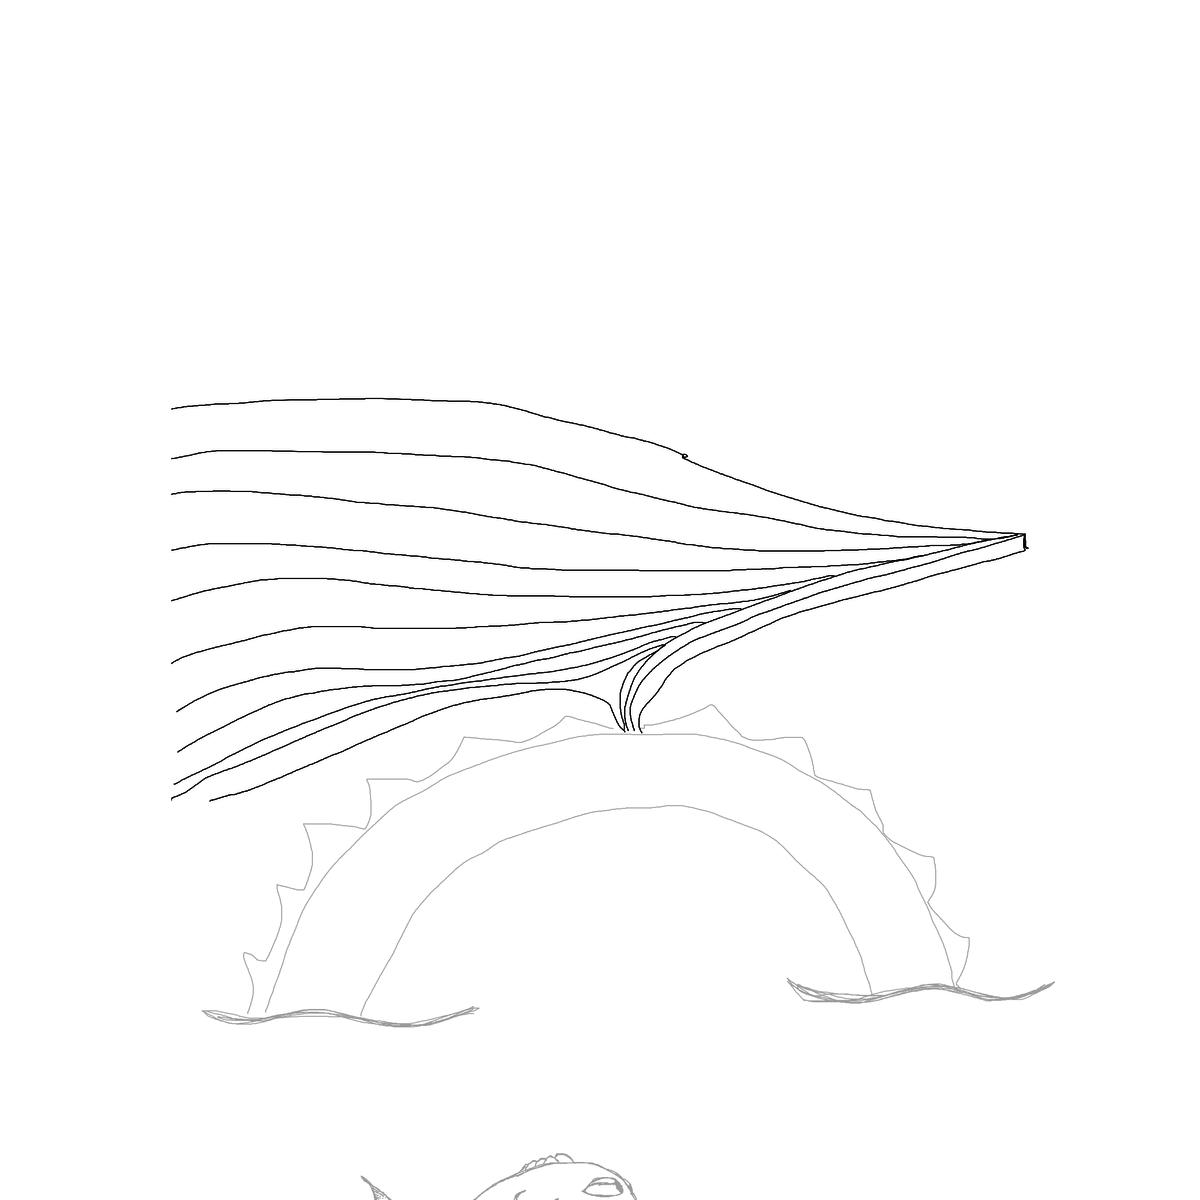 BAAAM drawing#2265 lat:43.4005508422851560lng: -1.7704961299896240